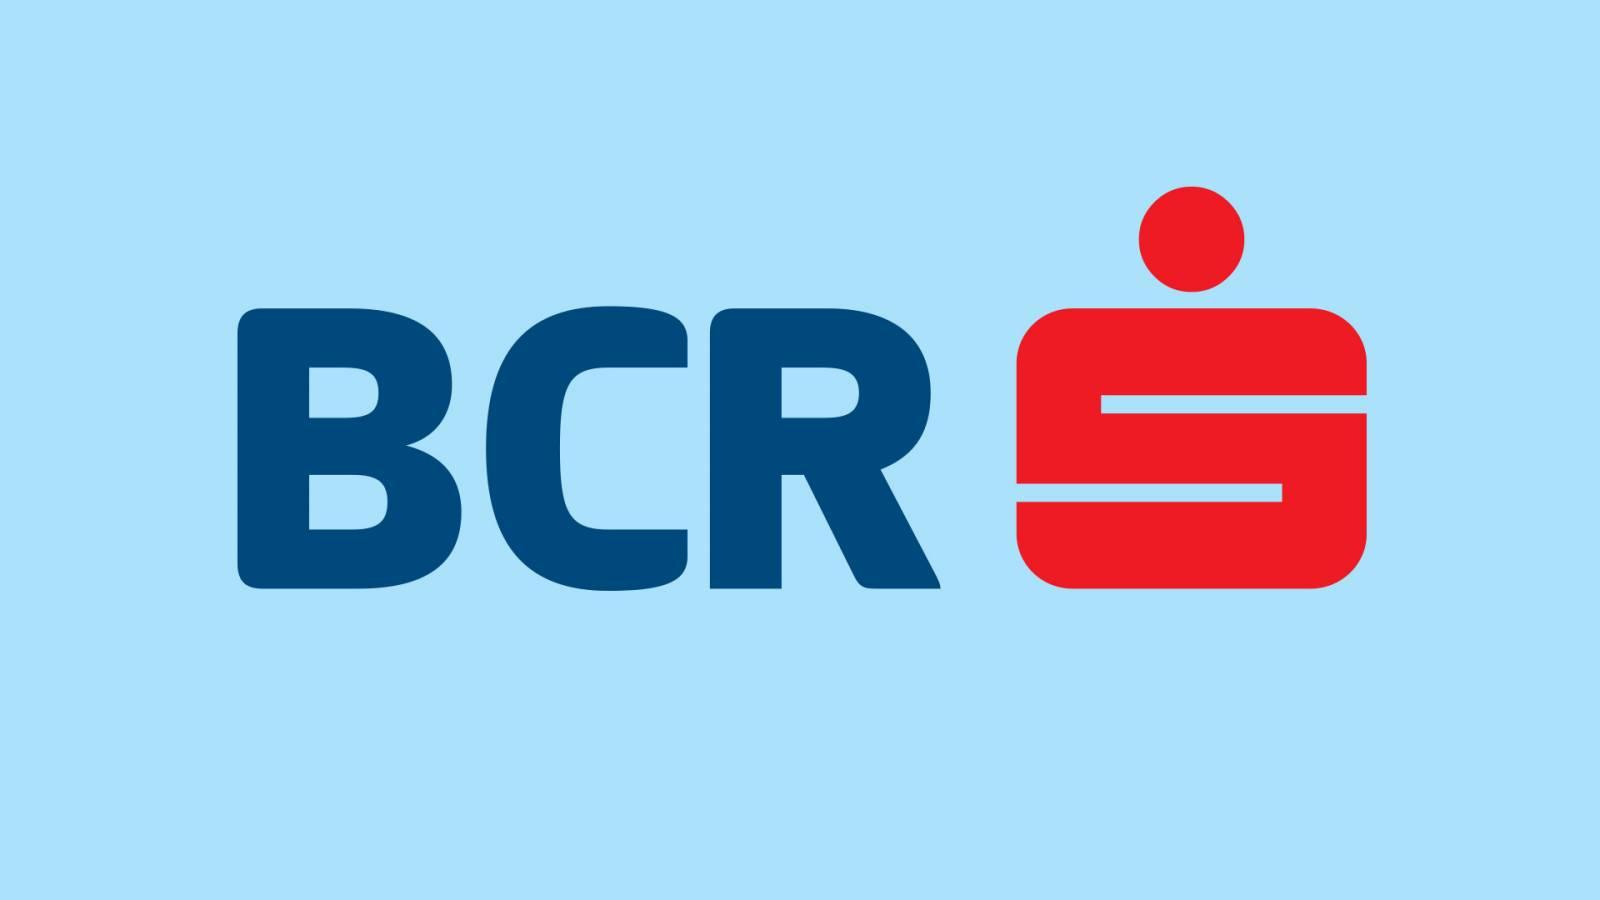 BCR Romania loteria